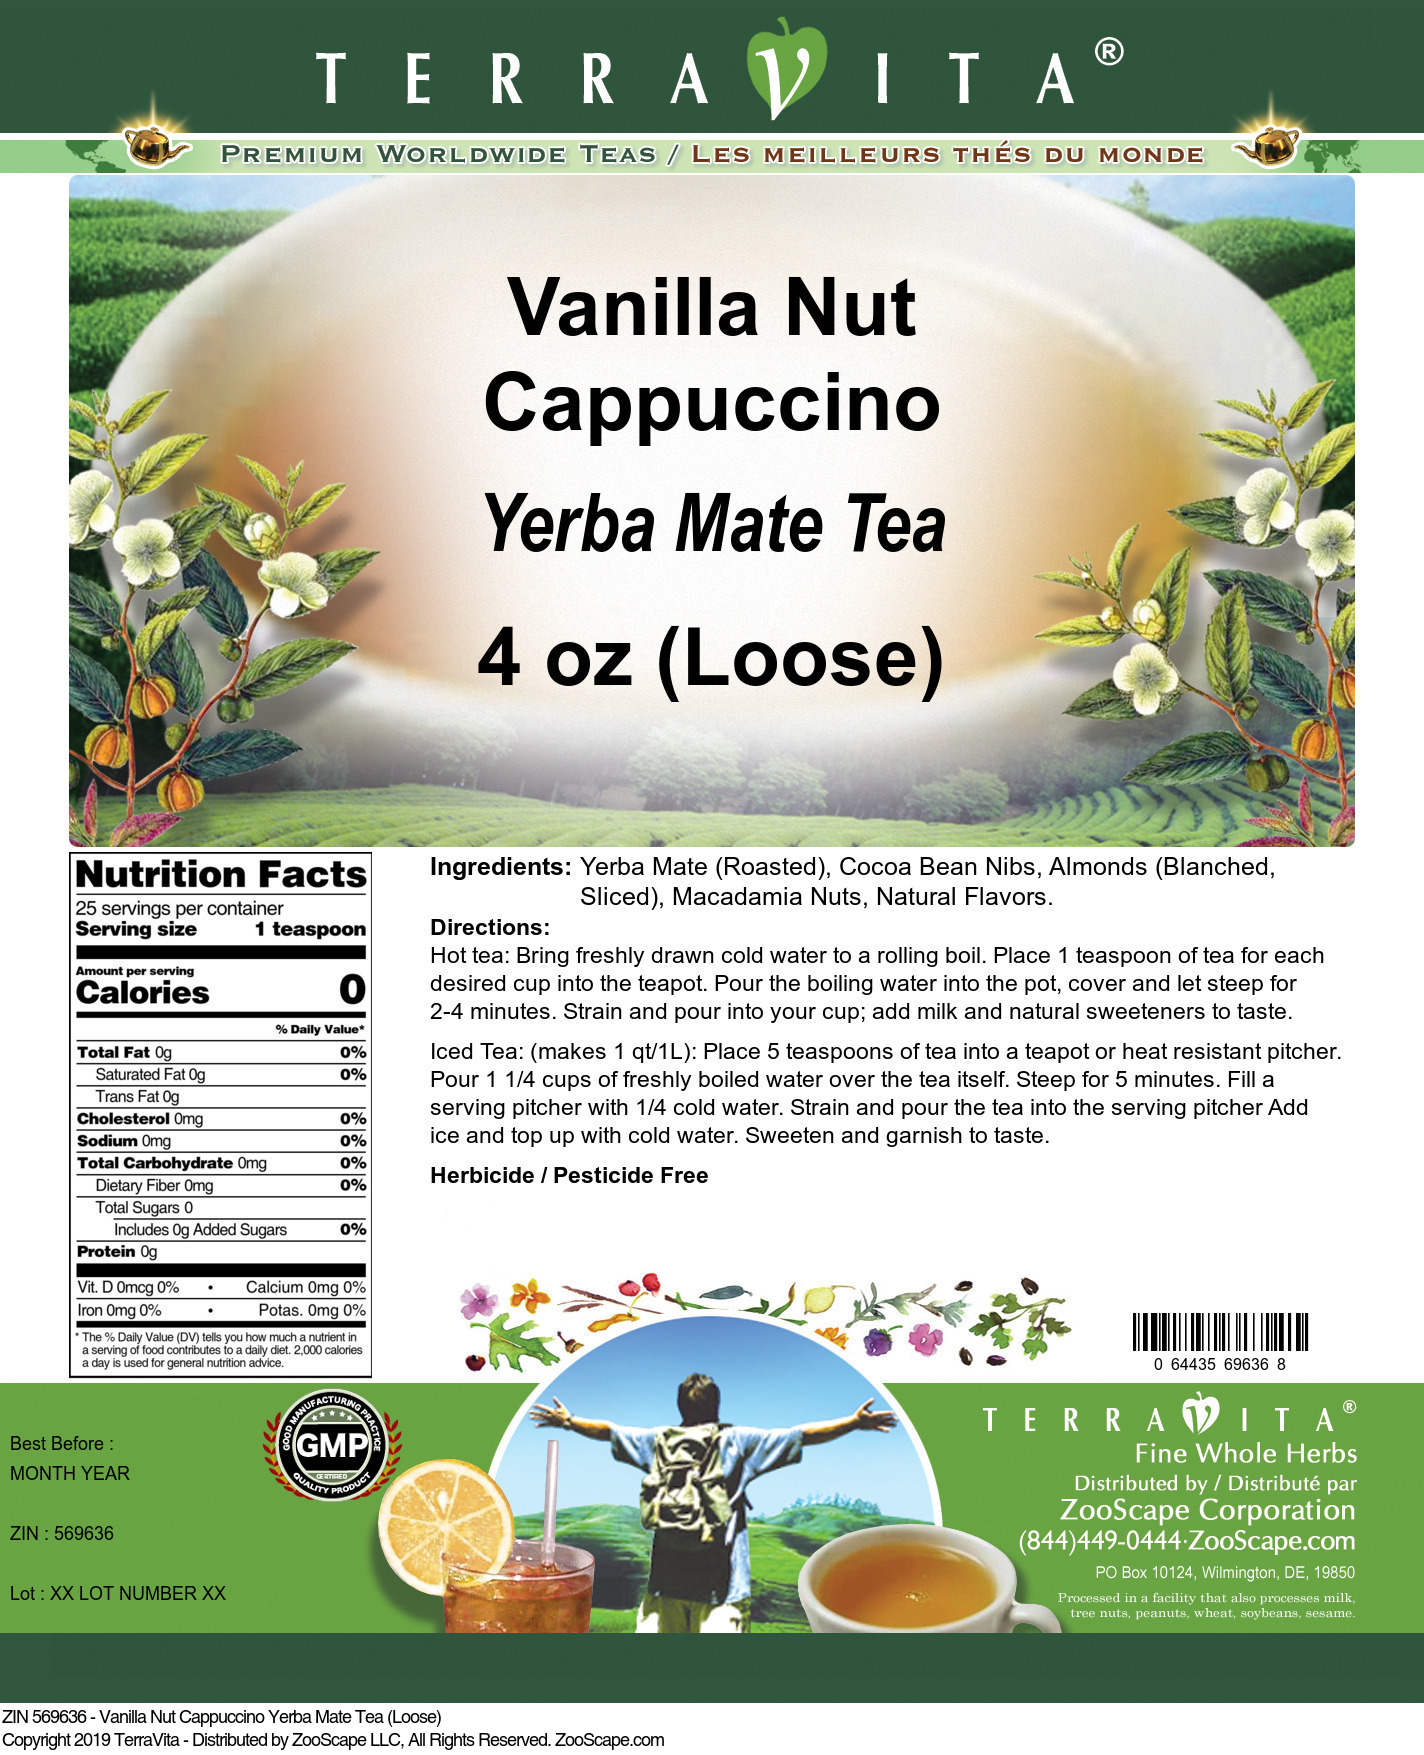 Vanilla Nut Cappuccino Yerba Mate Tea (Loose)